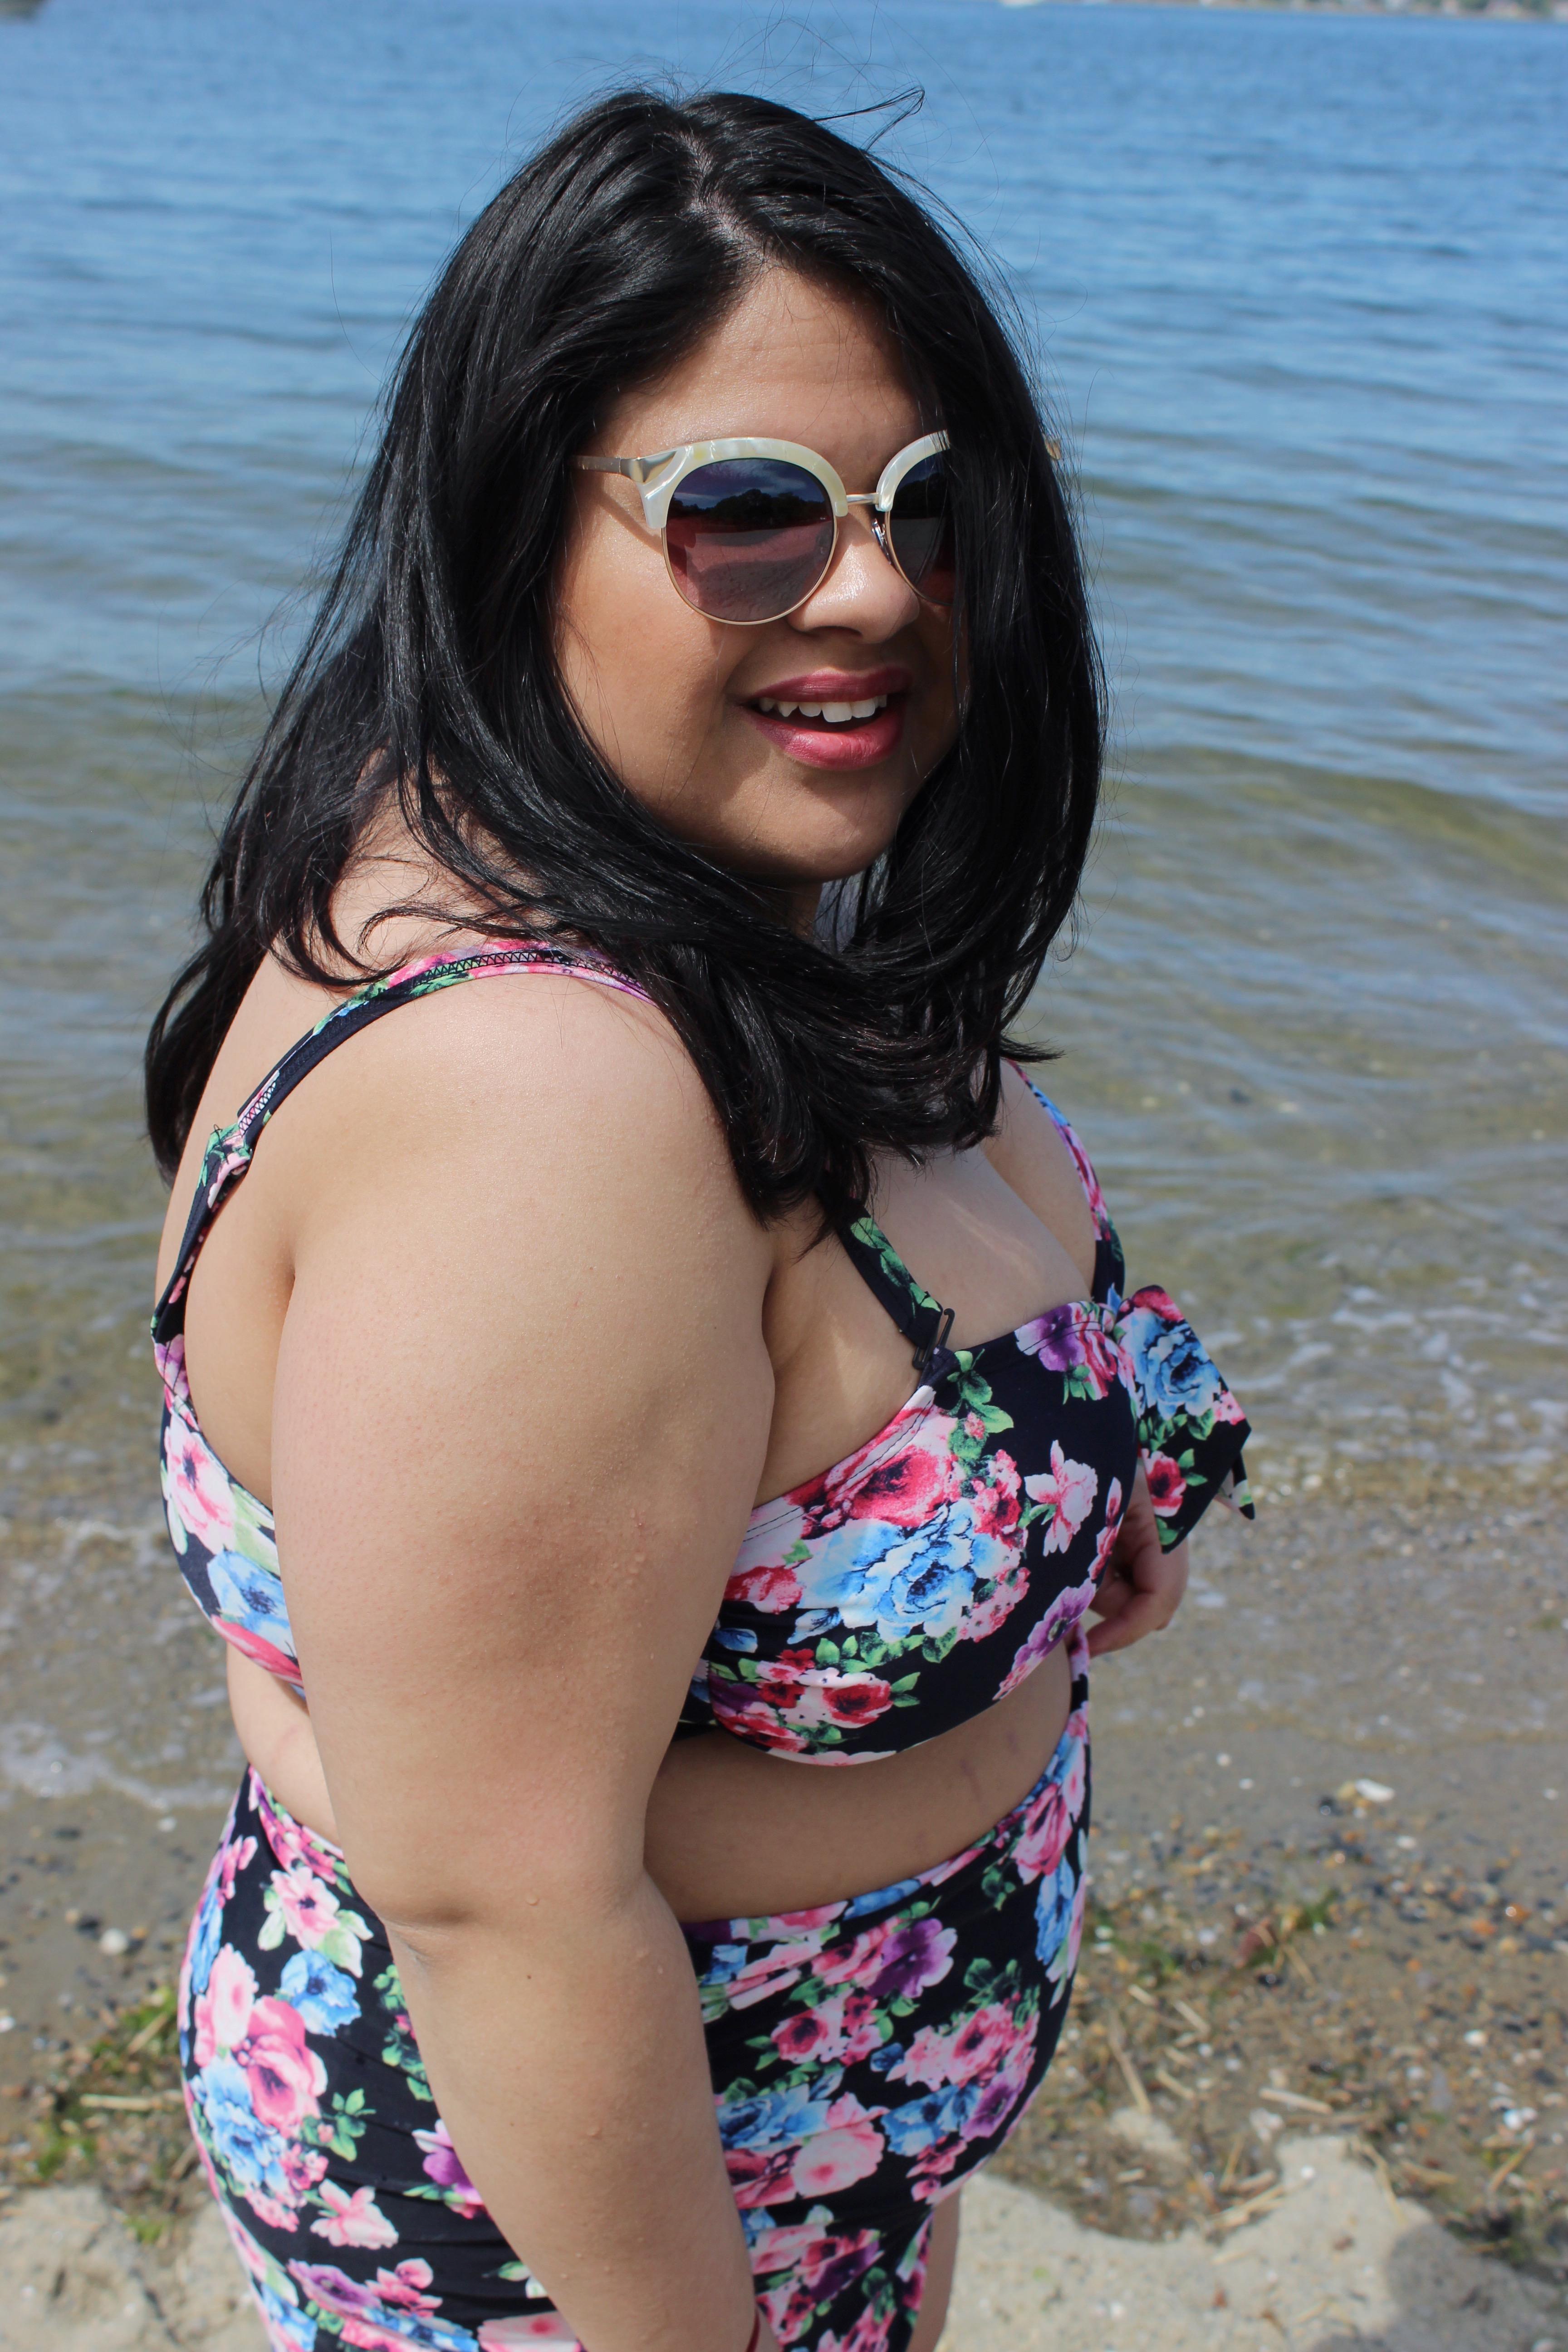 BodyPositivityBlogger